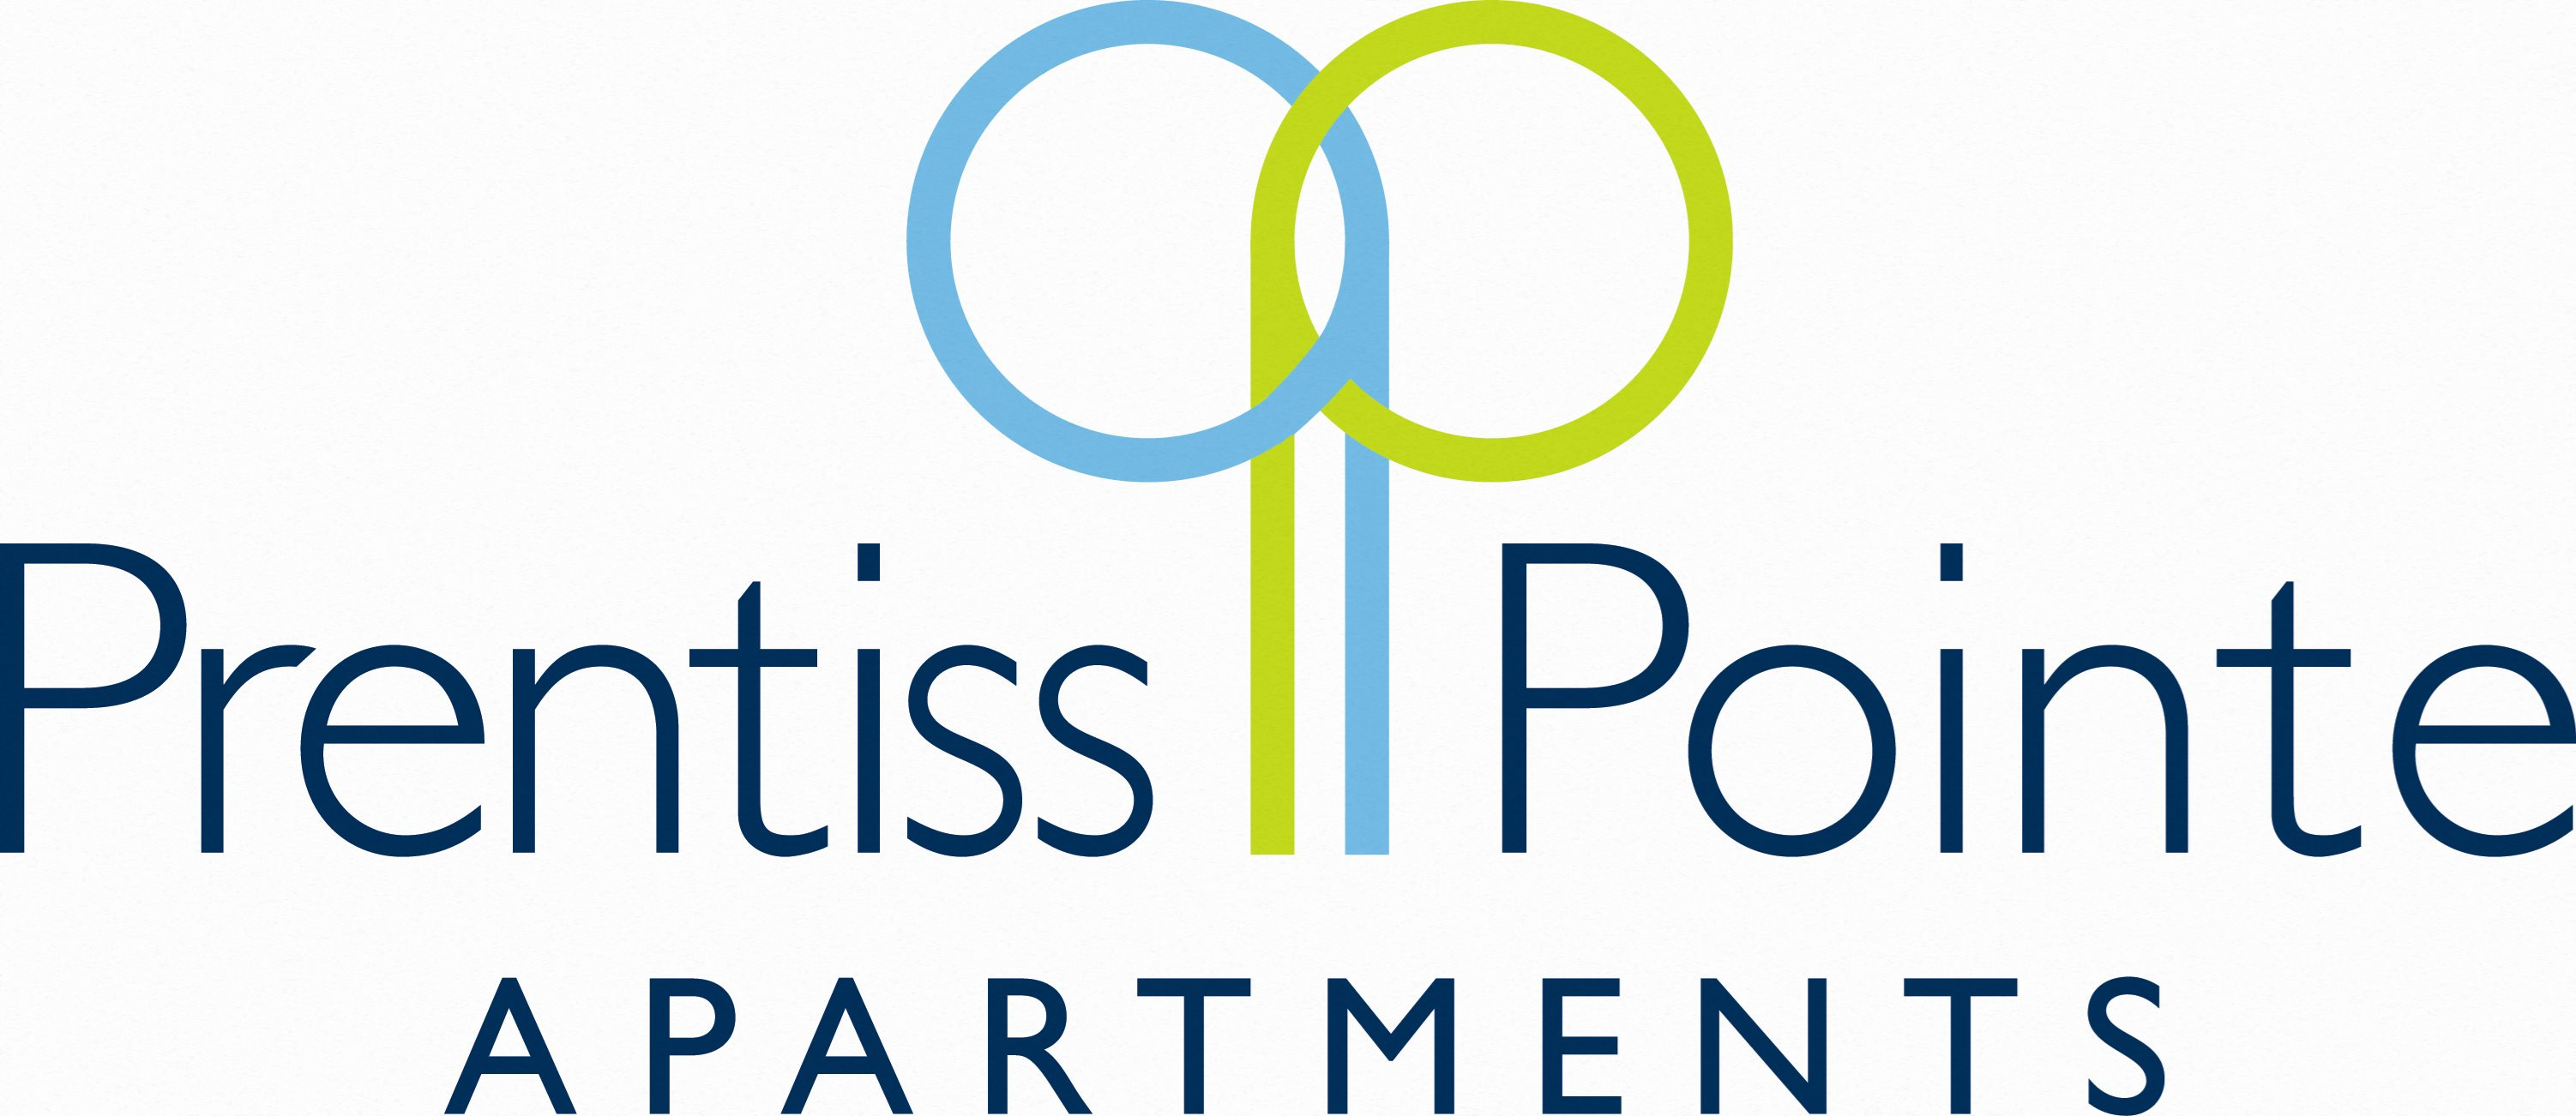 Logo for Prentiss Pointe Apartments in Harrison Township, MI